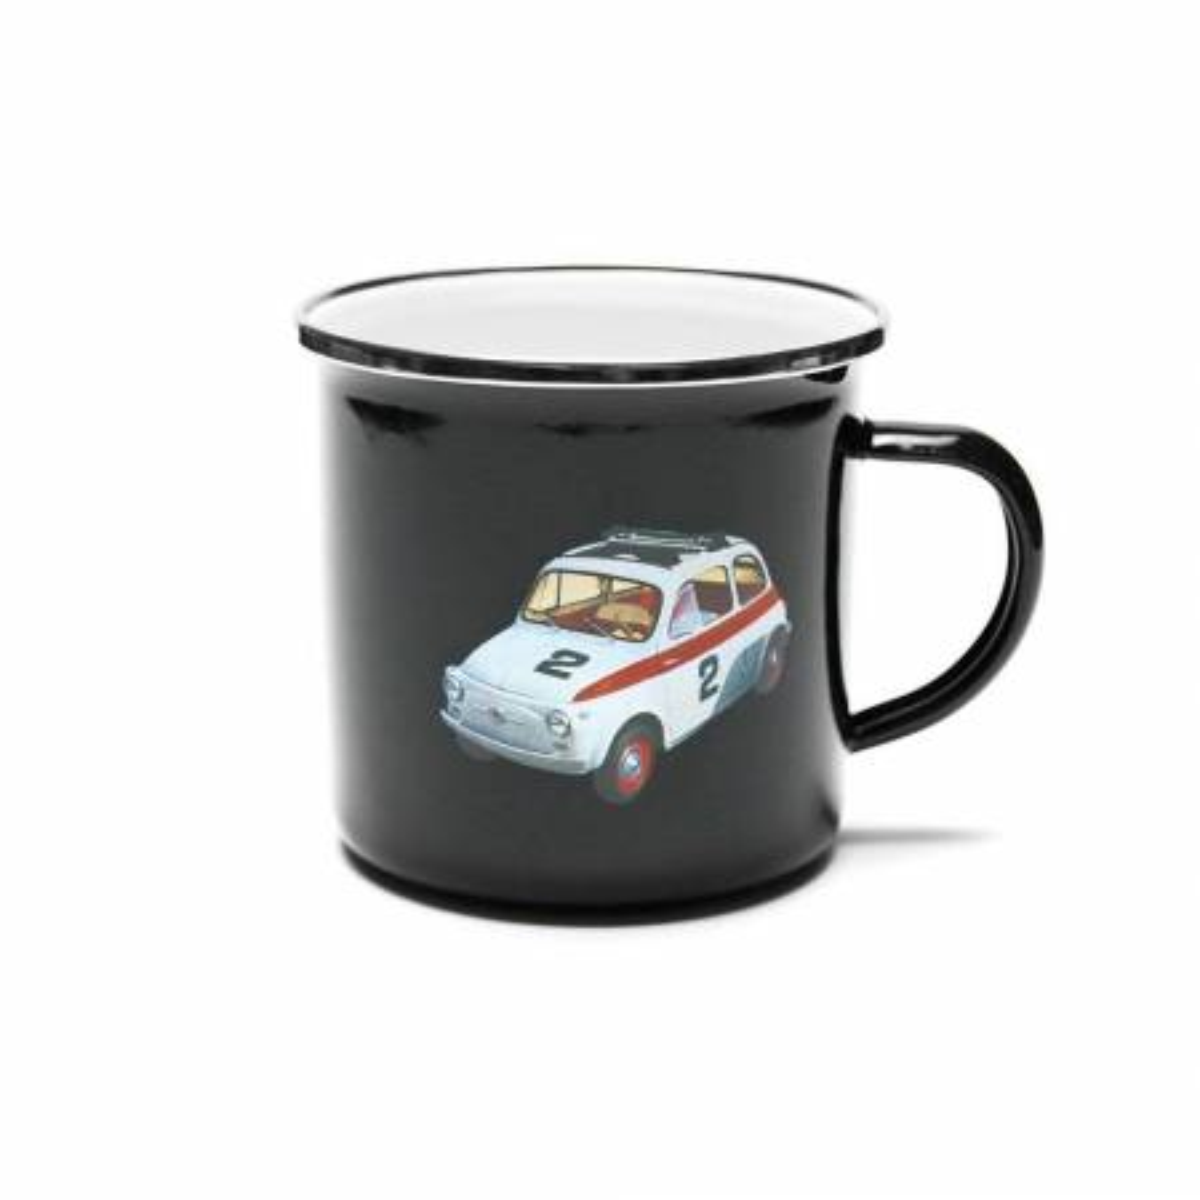 Tasse en métal Fiat 500 en émail Noir